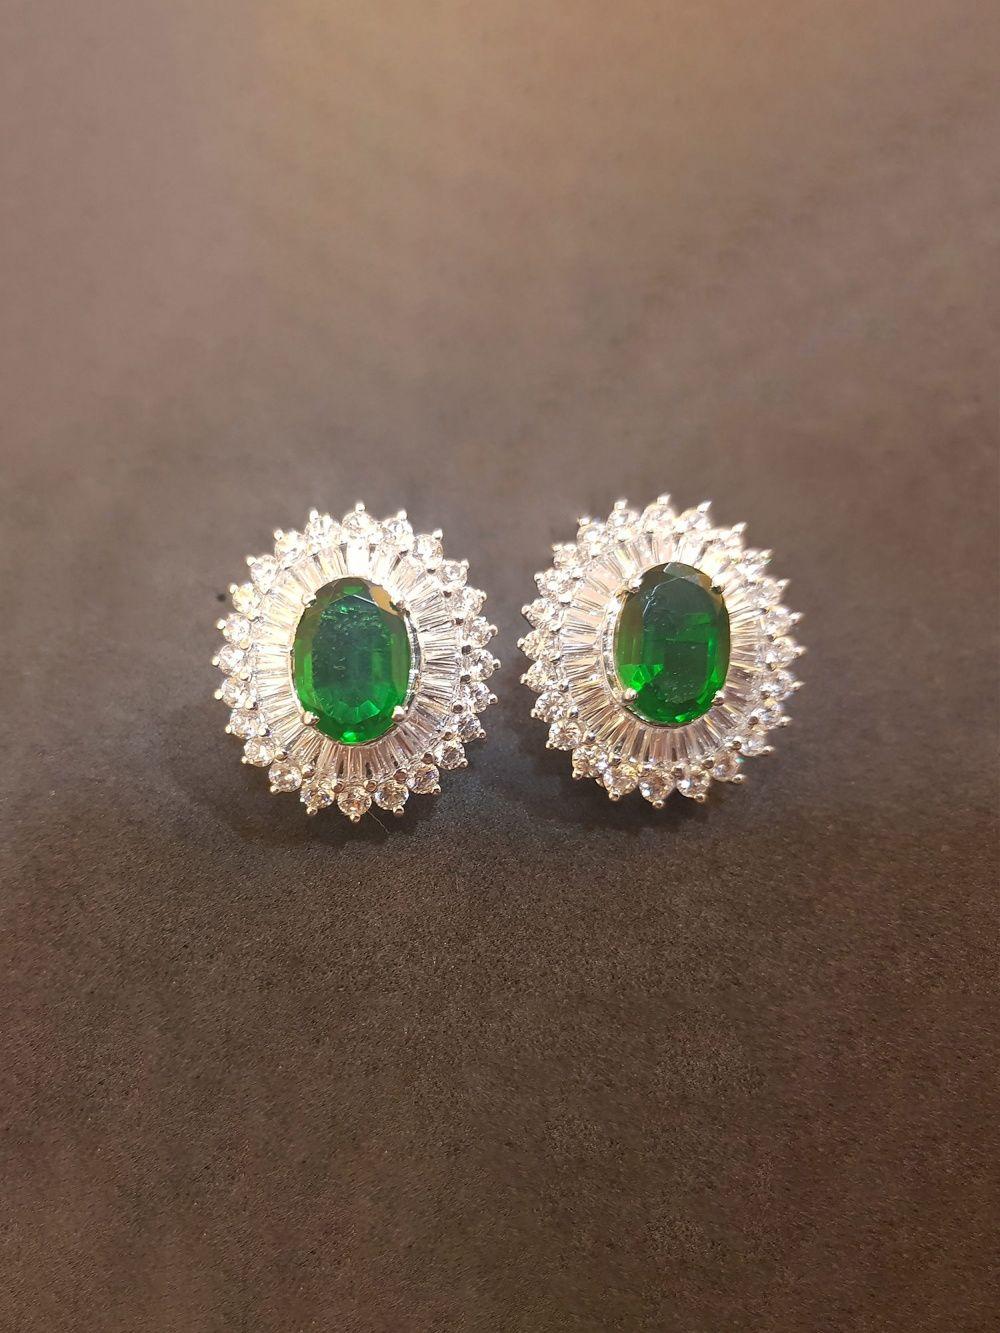 665752eeb Bejeweled Earrings : Buy Rhodium Finishe Green Stone Tops Online ...